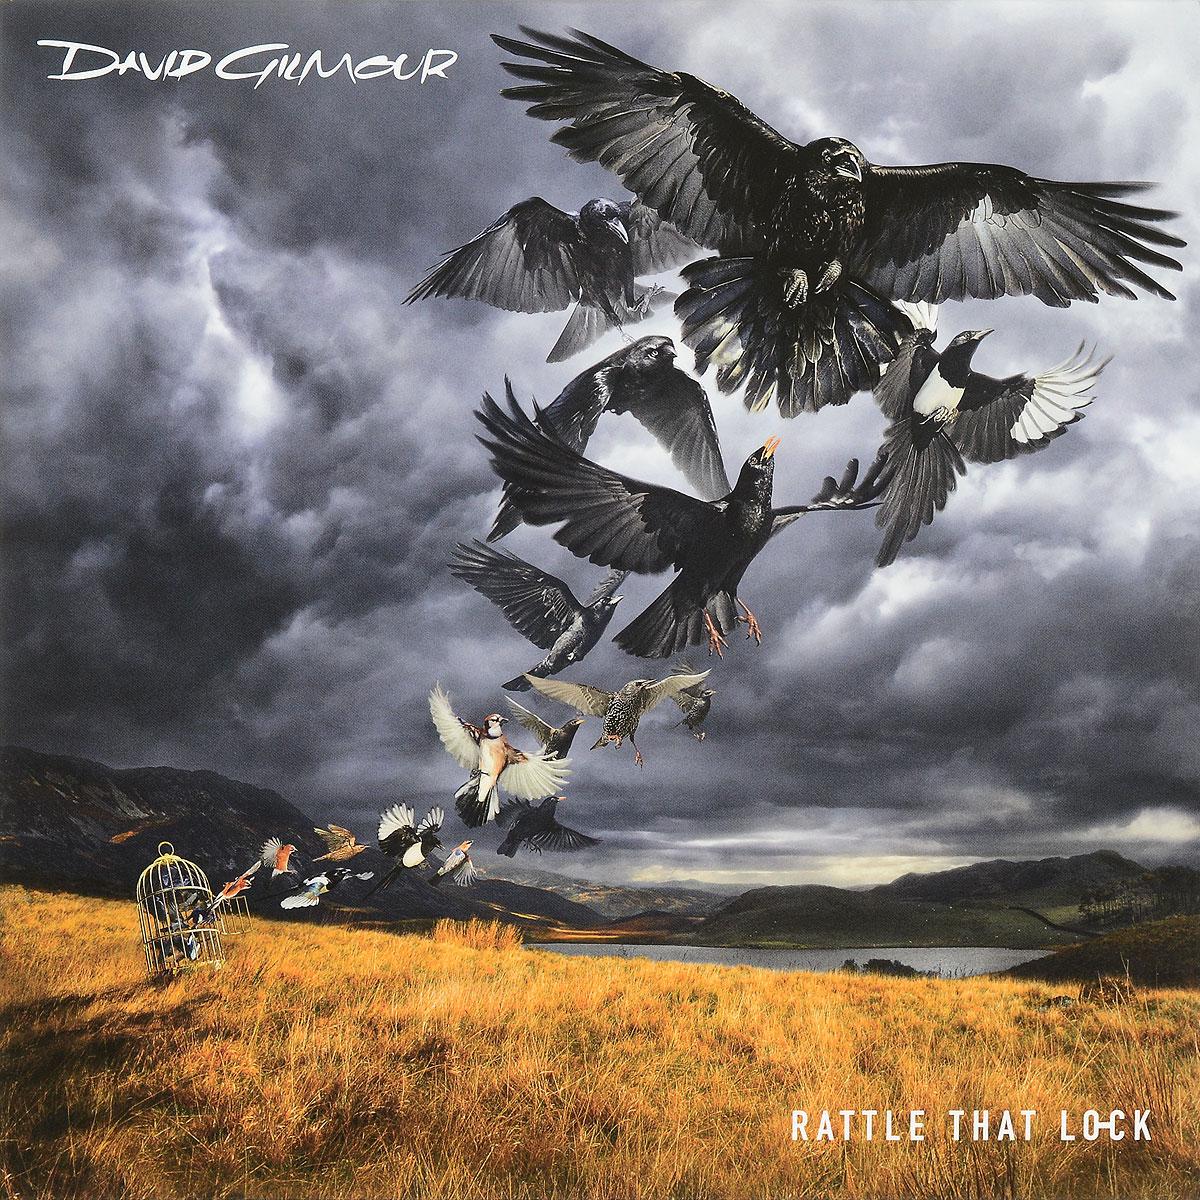 Дэвид Гилмор David Gilmour. Rattle That Lock (LP) cd диск david gilmour rattle that lock 1 cd